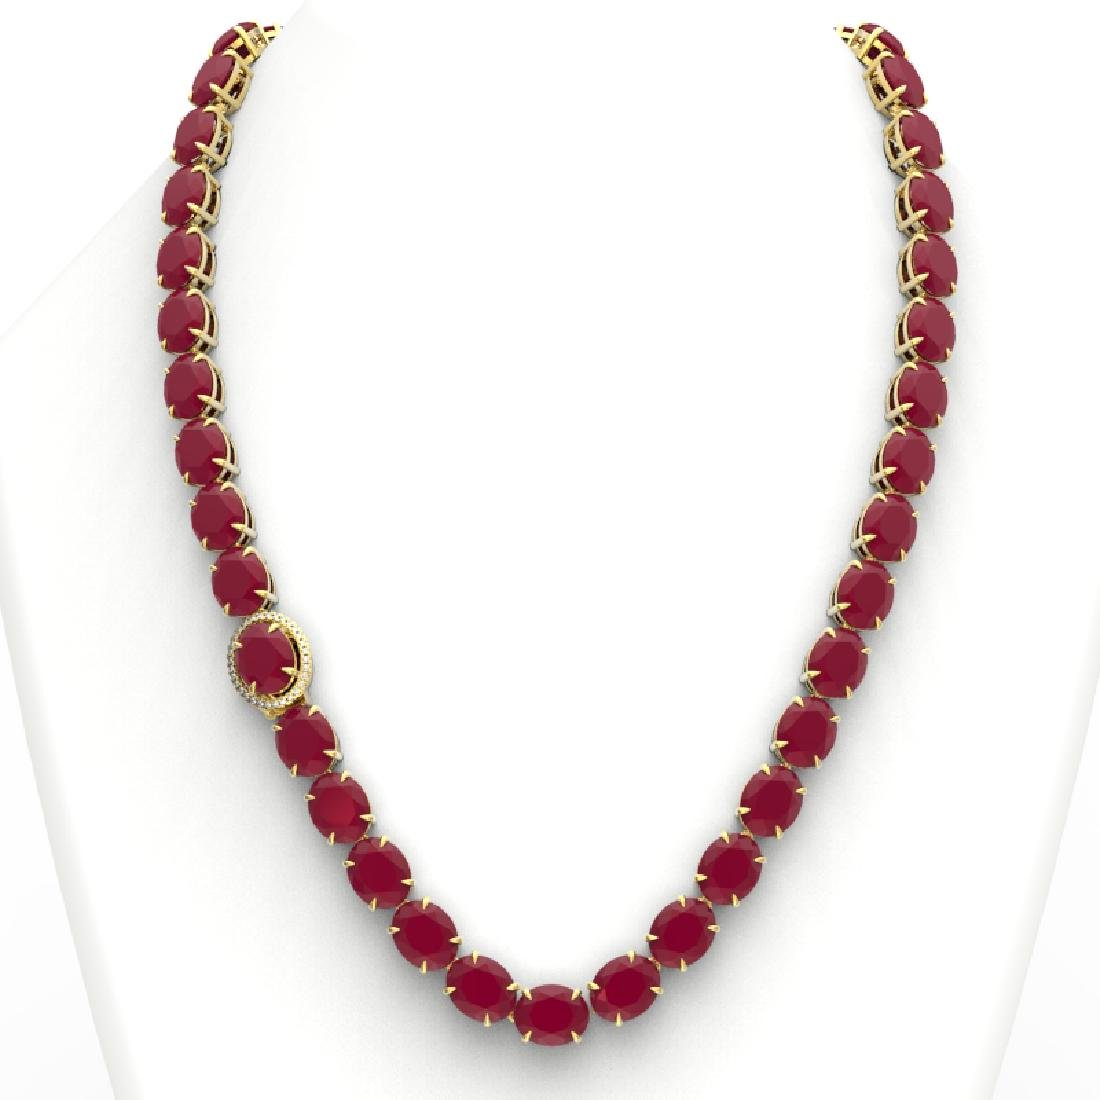 170 CTW Ruby & VS/SI Diamond Necklace 14K Yellow Gold - 3